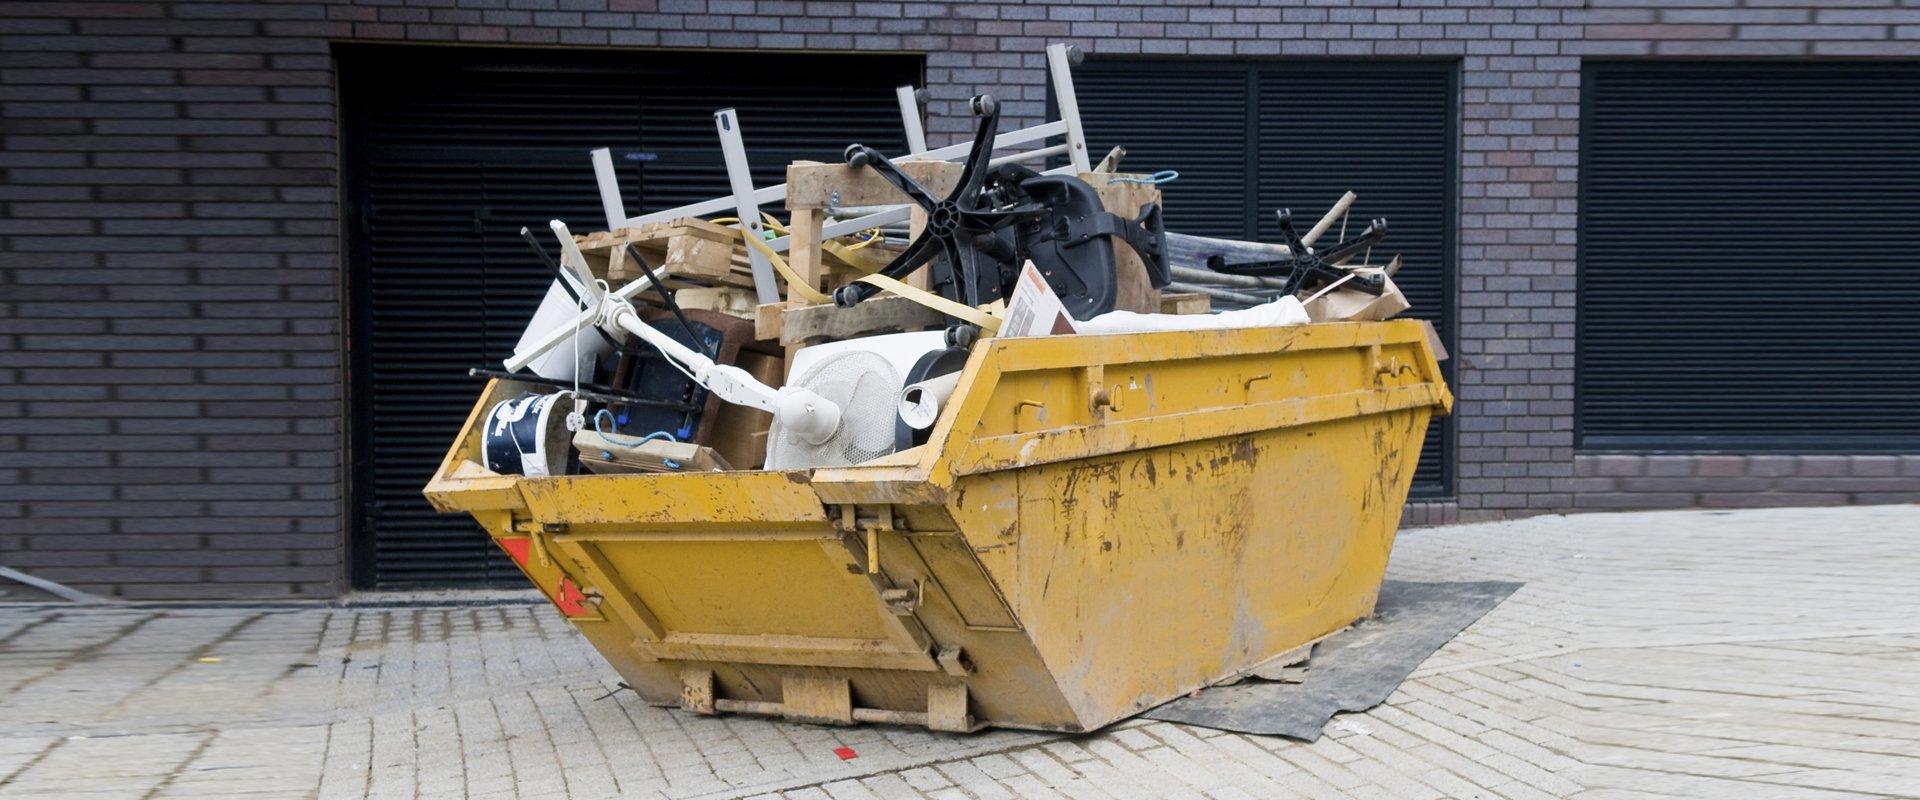 Budget Skips For Efficient Waste Removal In Wimborne